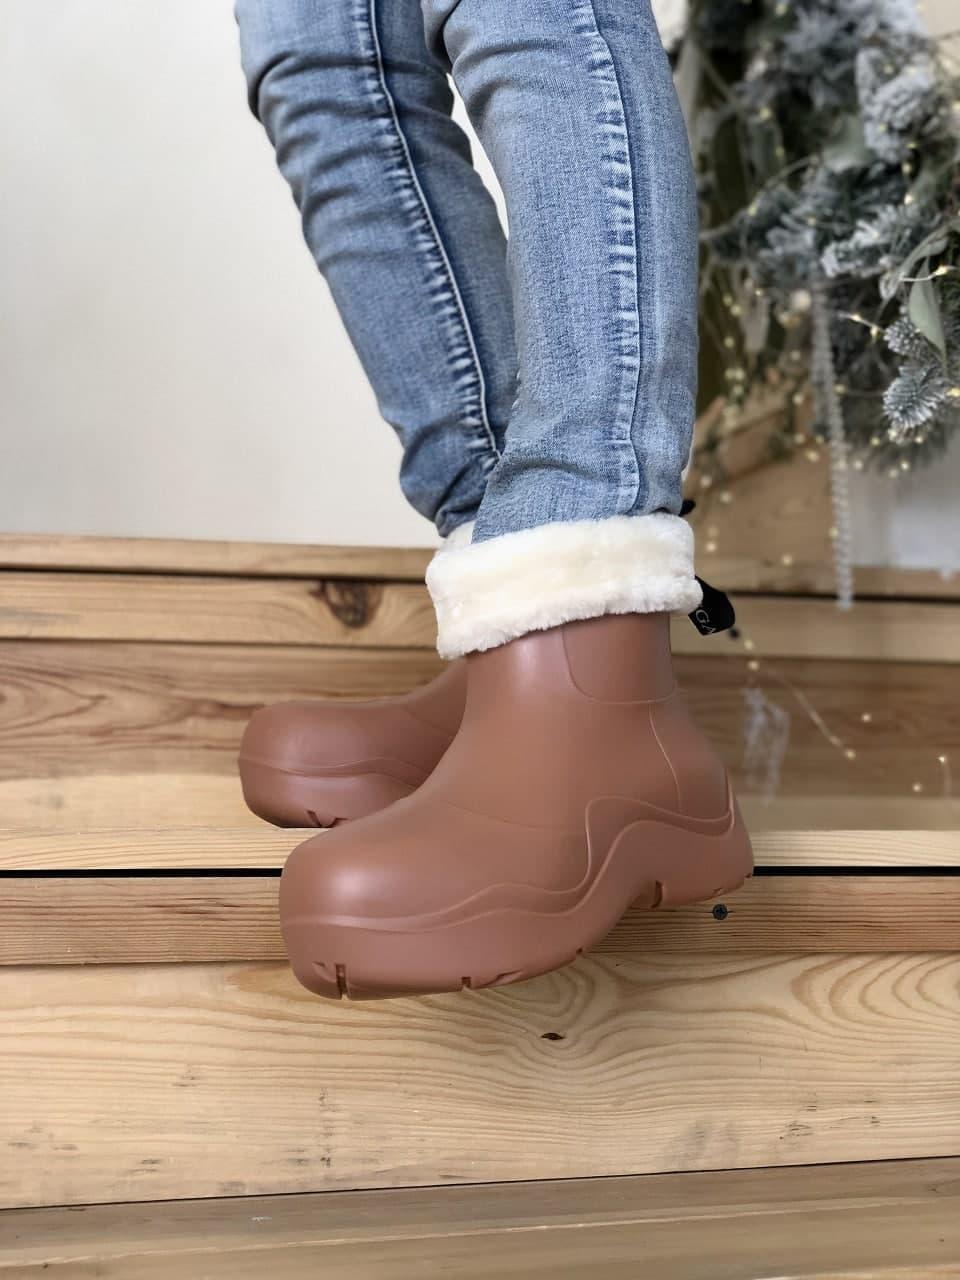 Женские ботинки Bottega Veneta  Puddle зима, демисезон (копия)